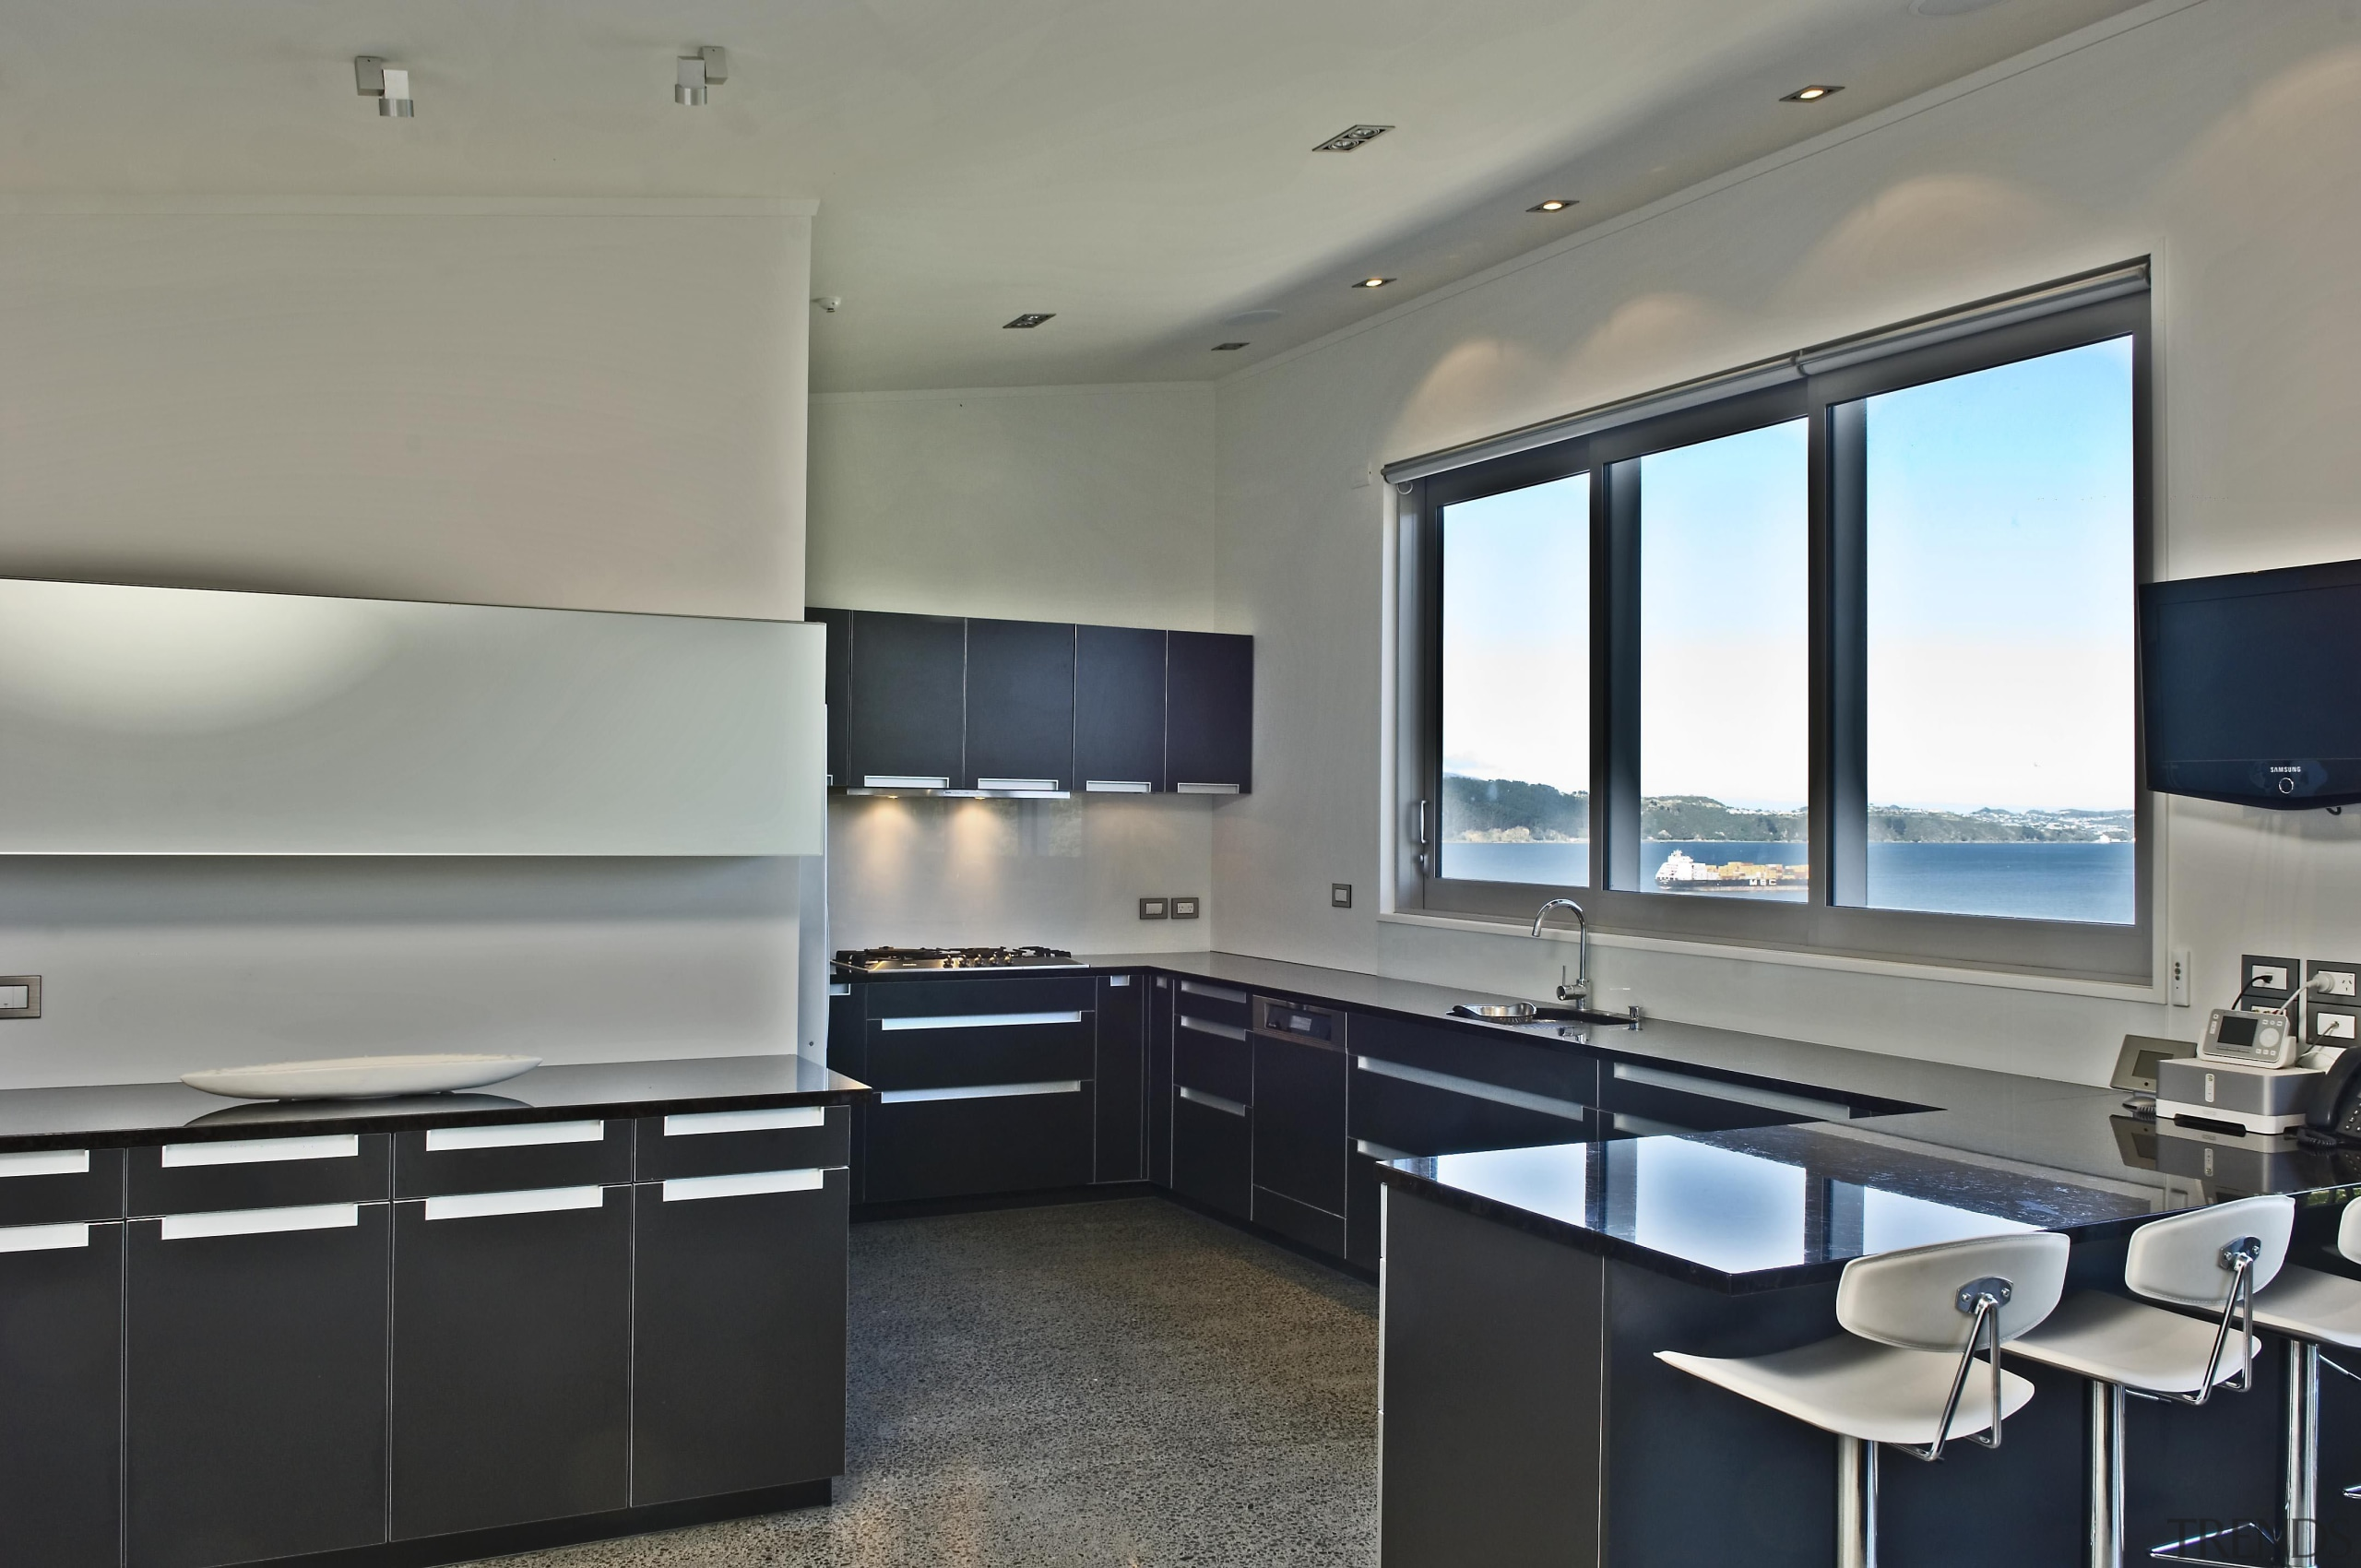 Wellington Kitchen Designer of the Year 2007National Kitchen interior design, kitchen, property, real estate, gray, black